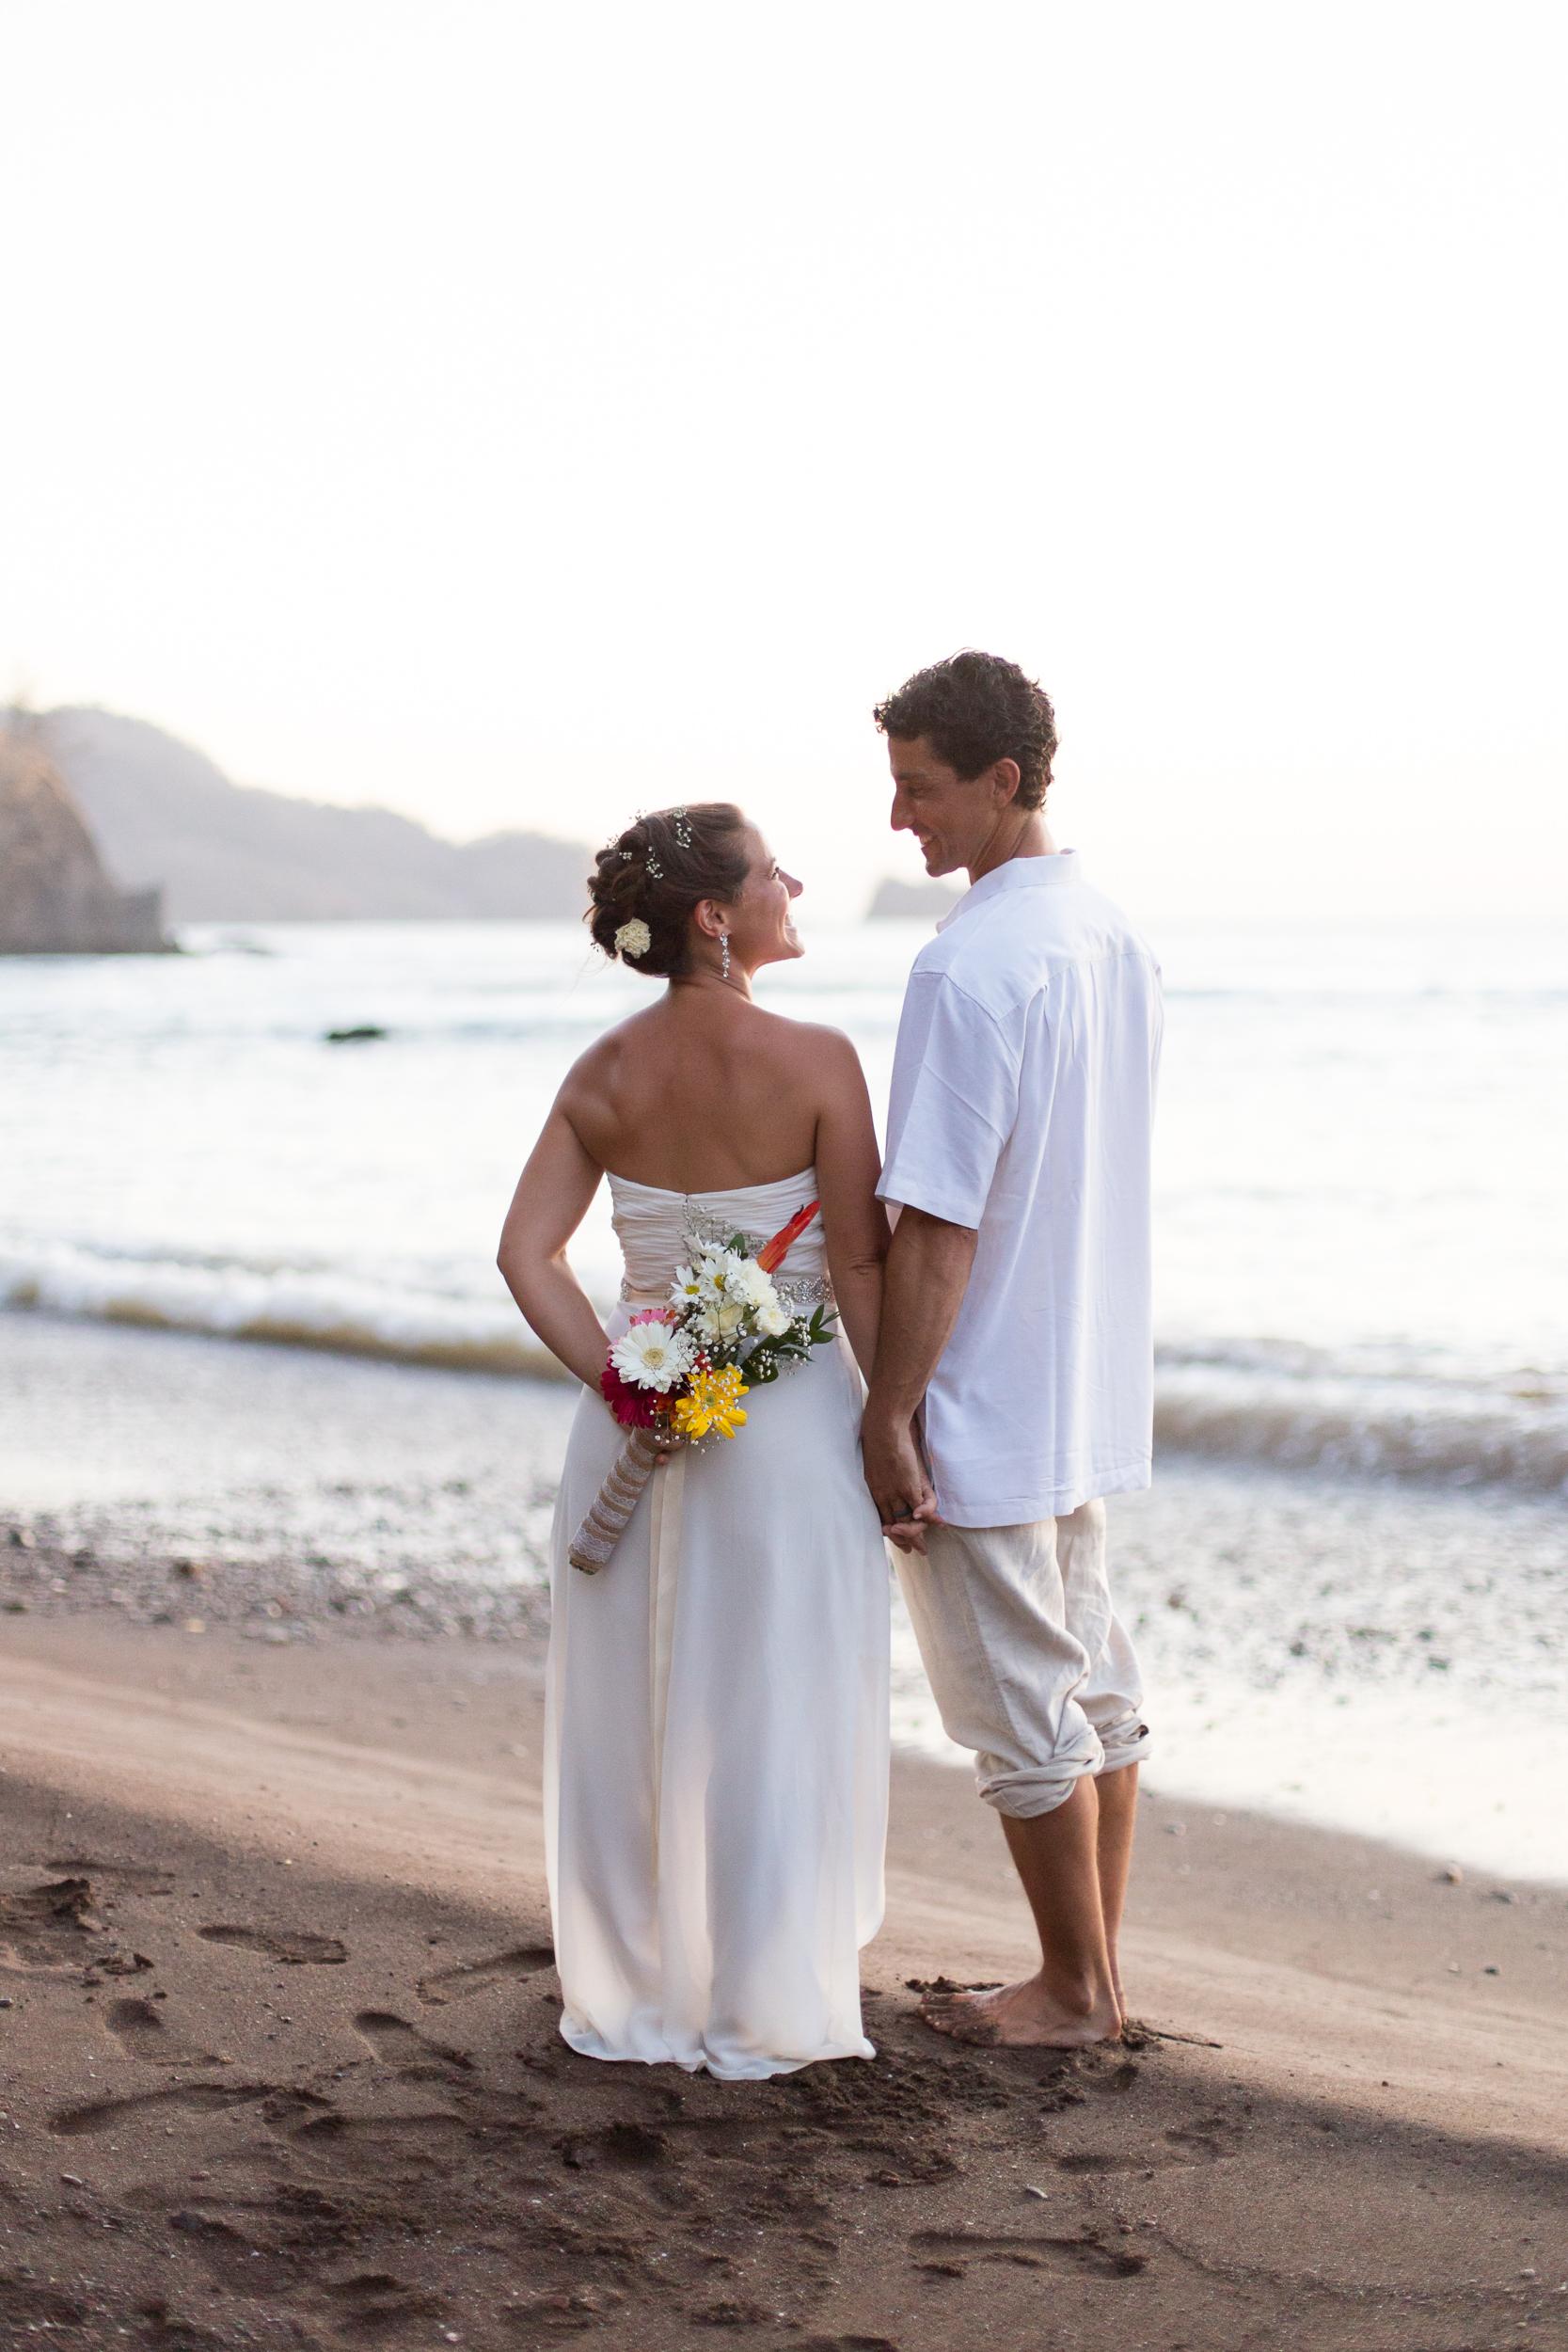 Lacie Wedding_Kelsie Hendricks Photography_Costa Rica-75.jpg